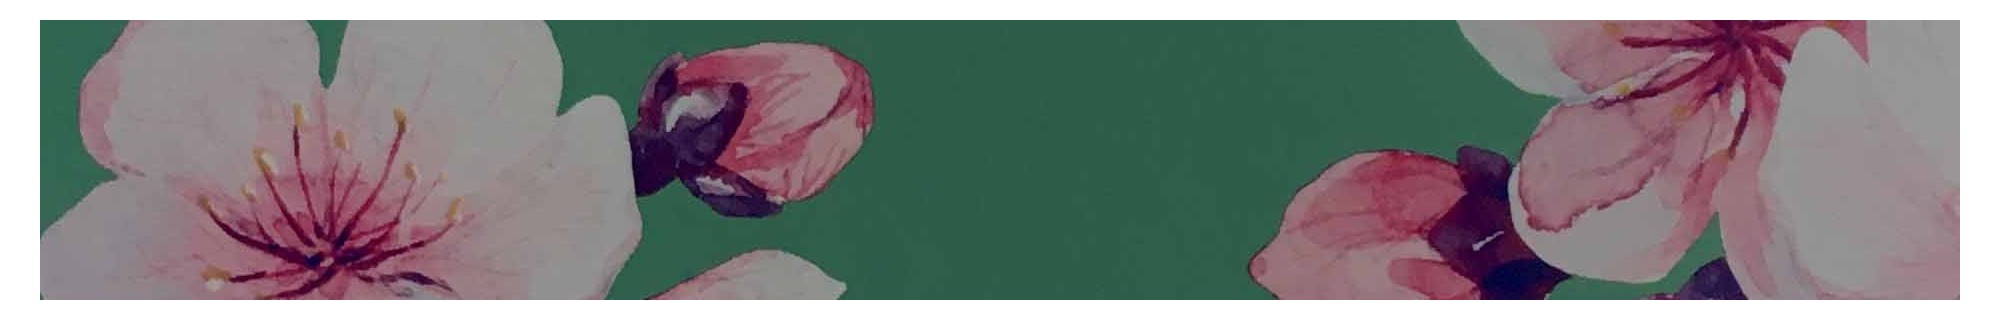 Uova di Pasqua Lindt ,Kinder,Perugina-Vendita Online al miglior Prezzo